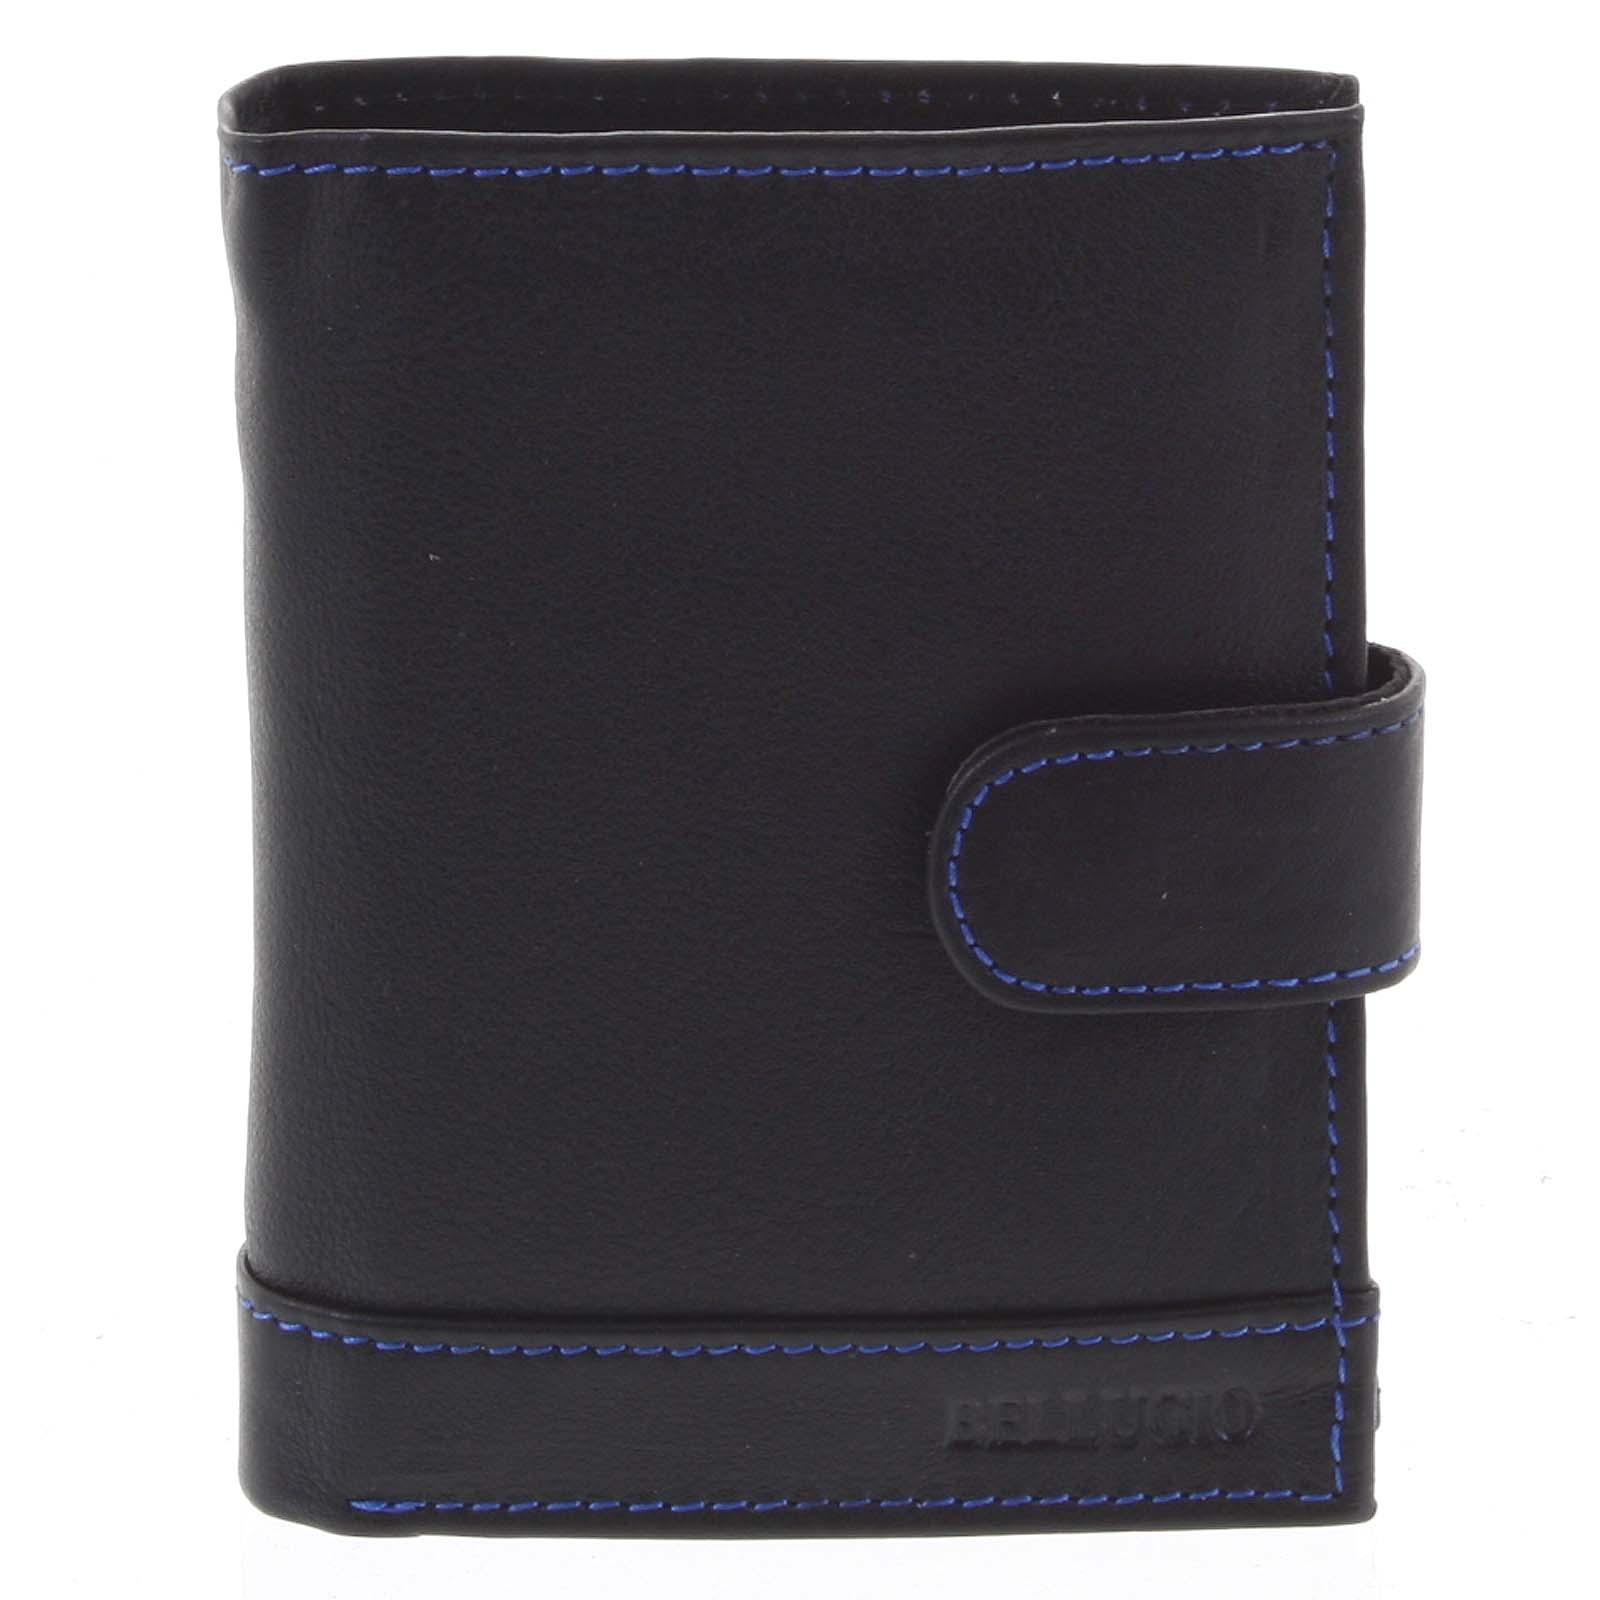 Pánská kožená peněženka černo modrá - Bellugio Garner